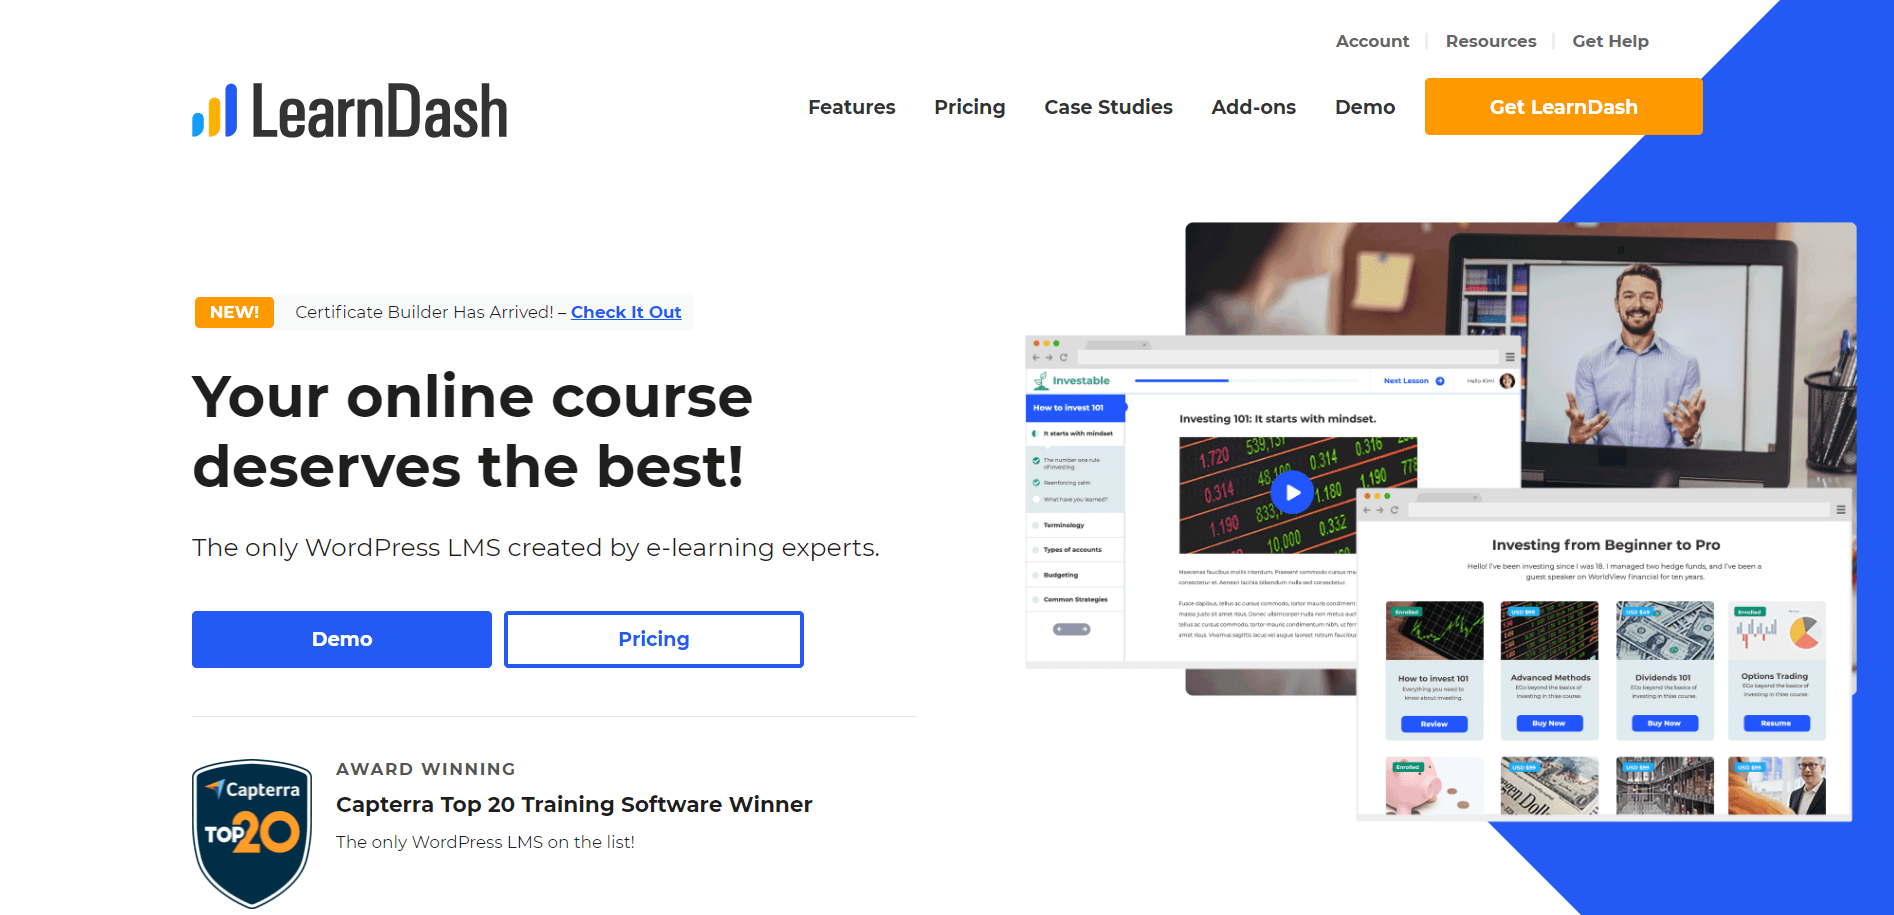 LearnDash course review